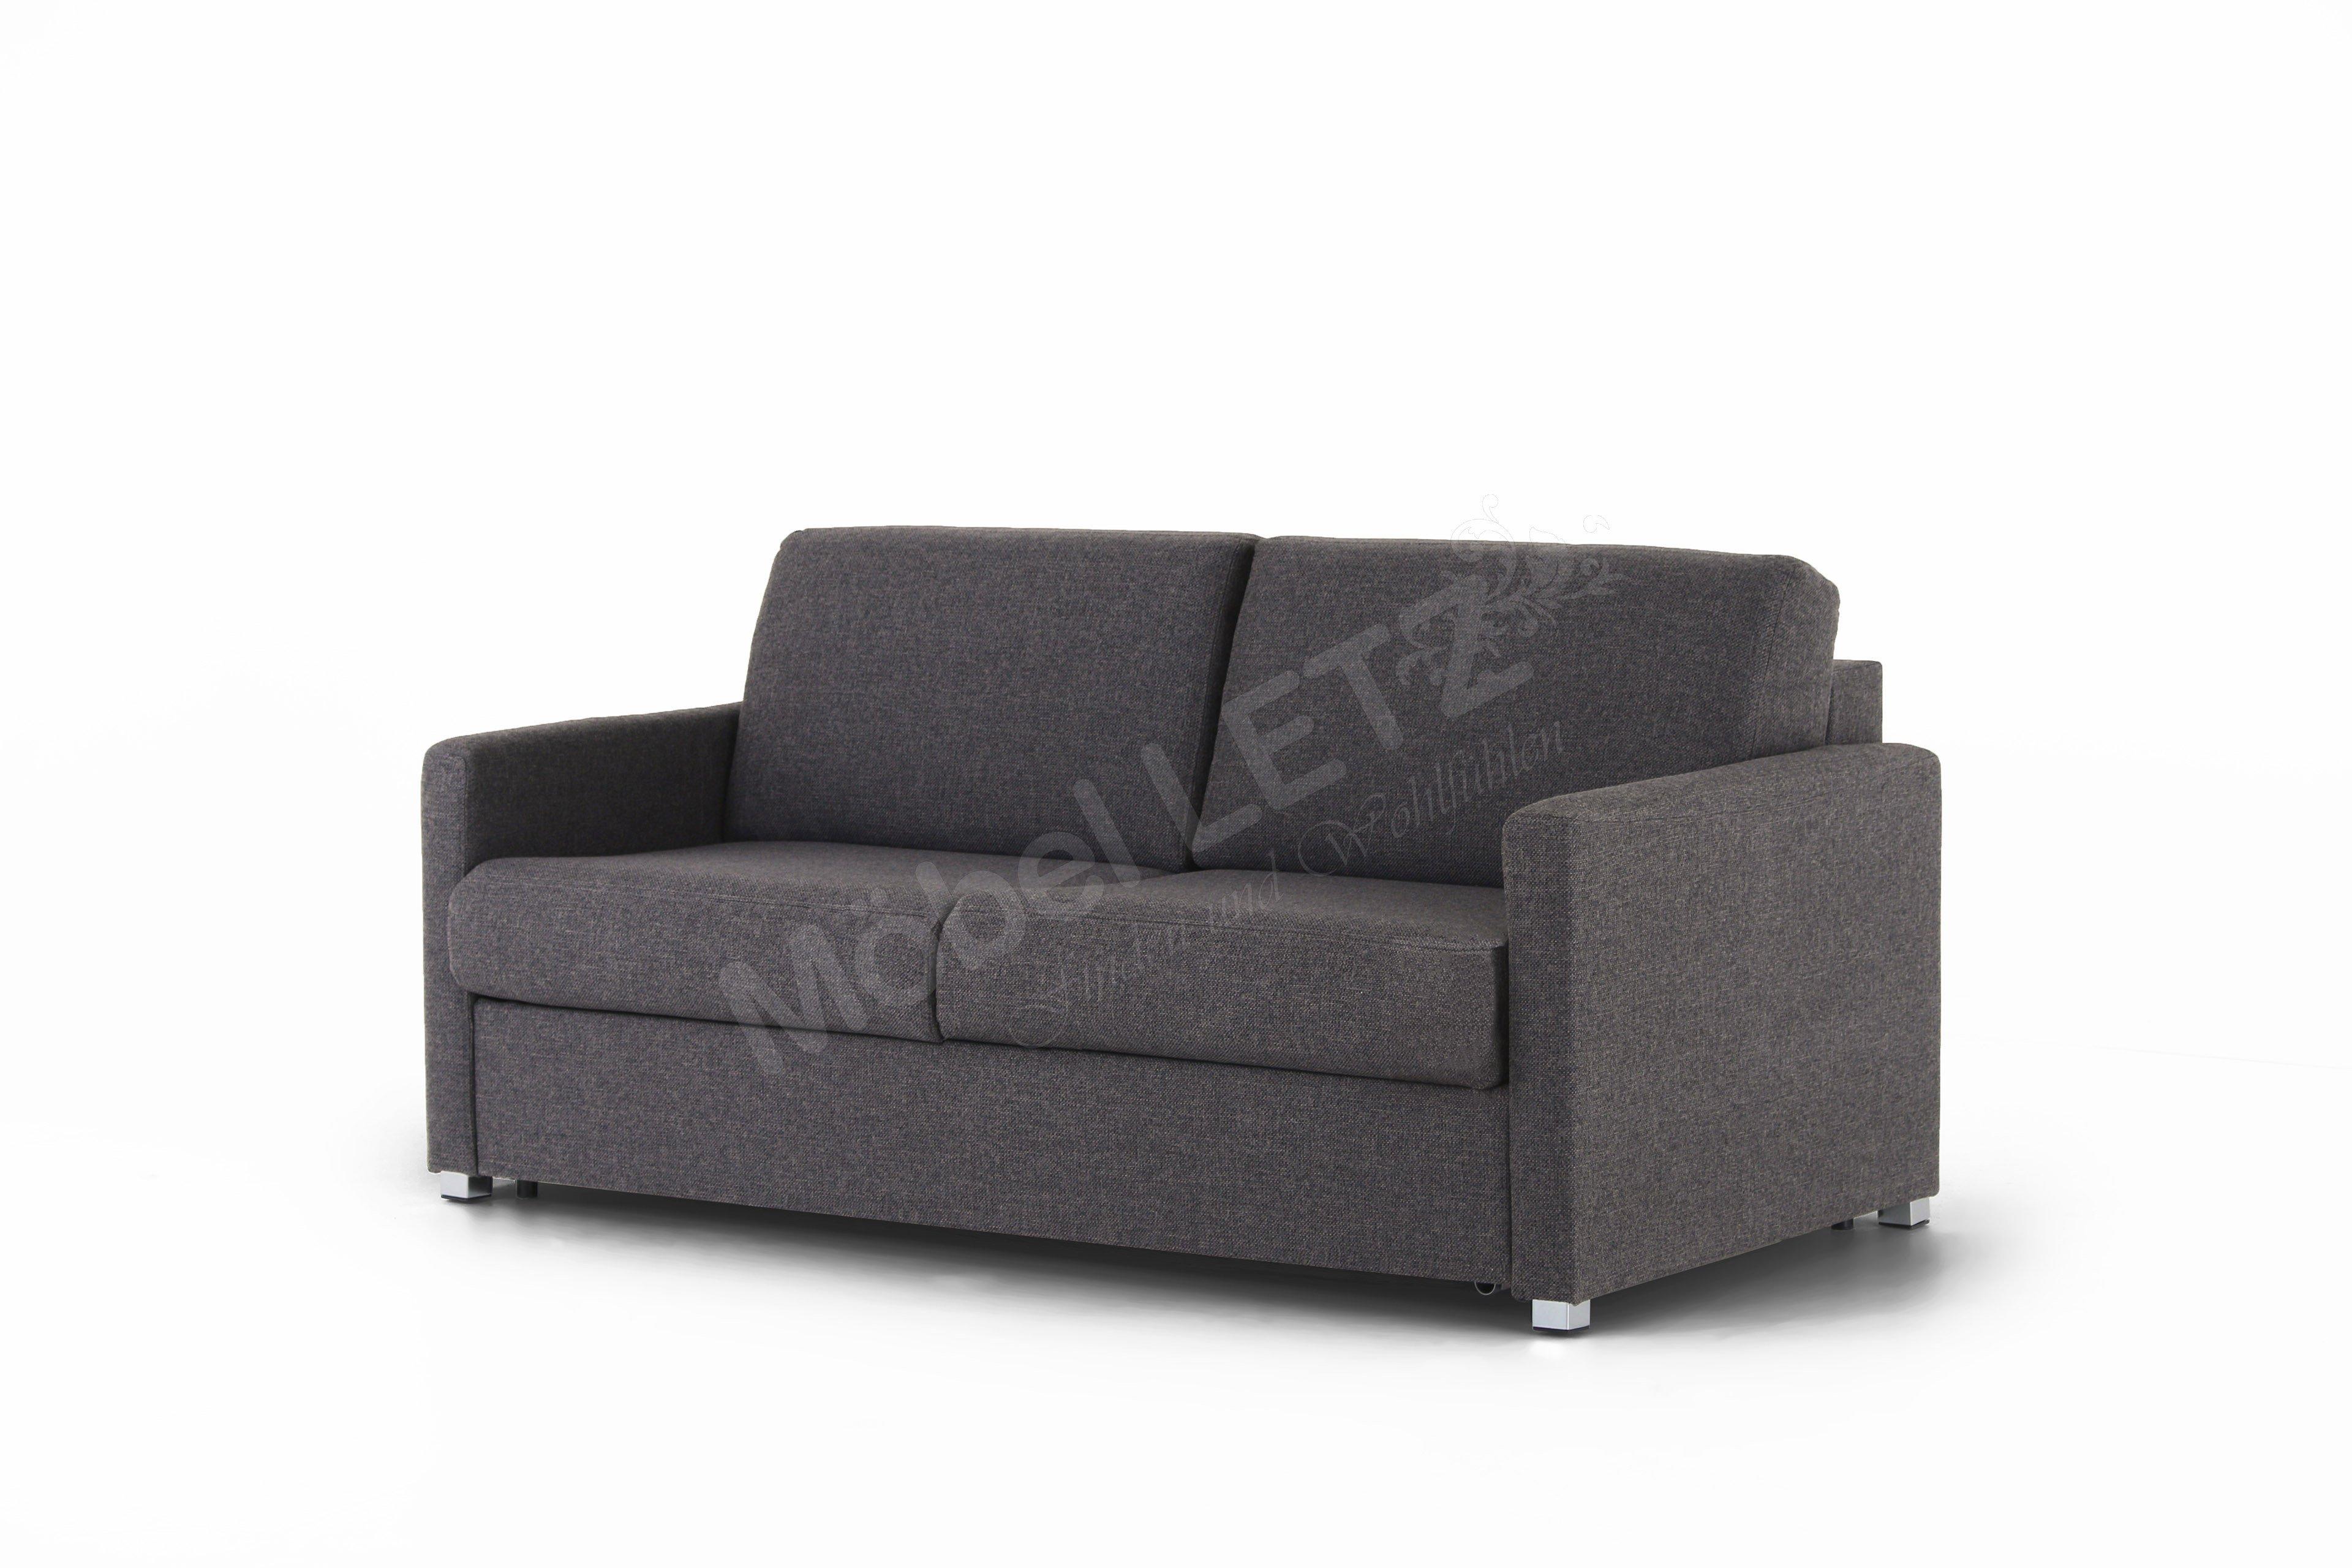 restyl kathy schlafsofa mit separater matratze l m bel. Black Bedroom Furniture Sets. Home Design Ideas